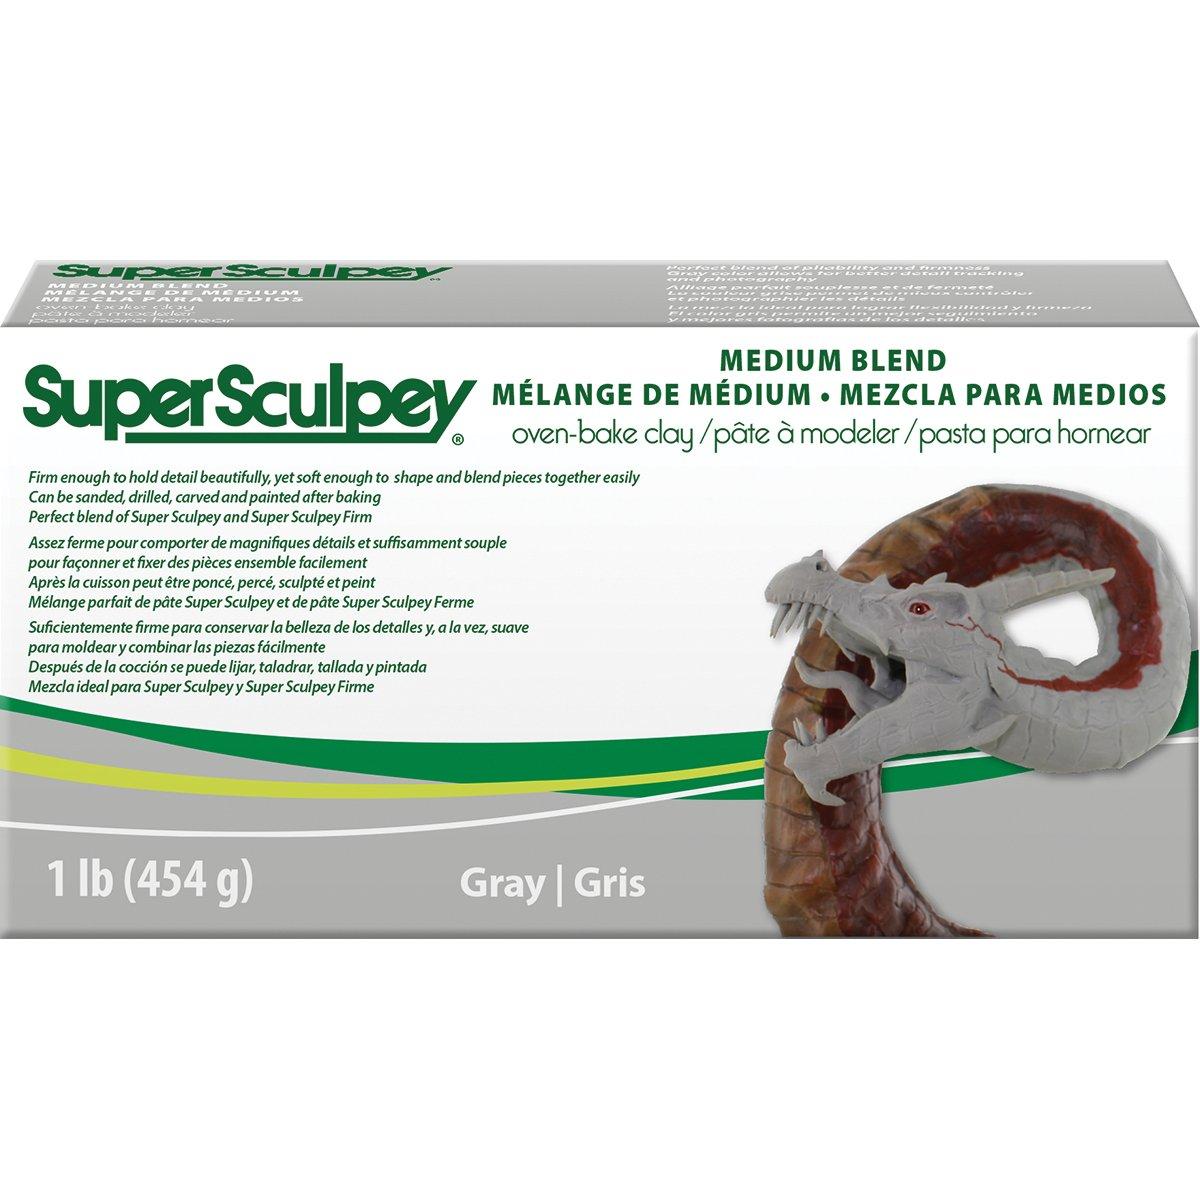 Sculpey SSMED1 Medium Blend by Super Sculpey